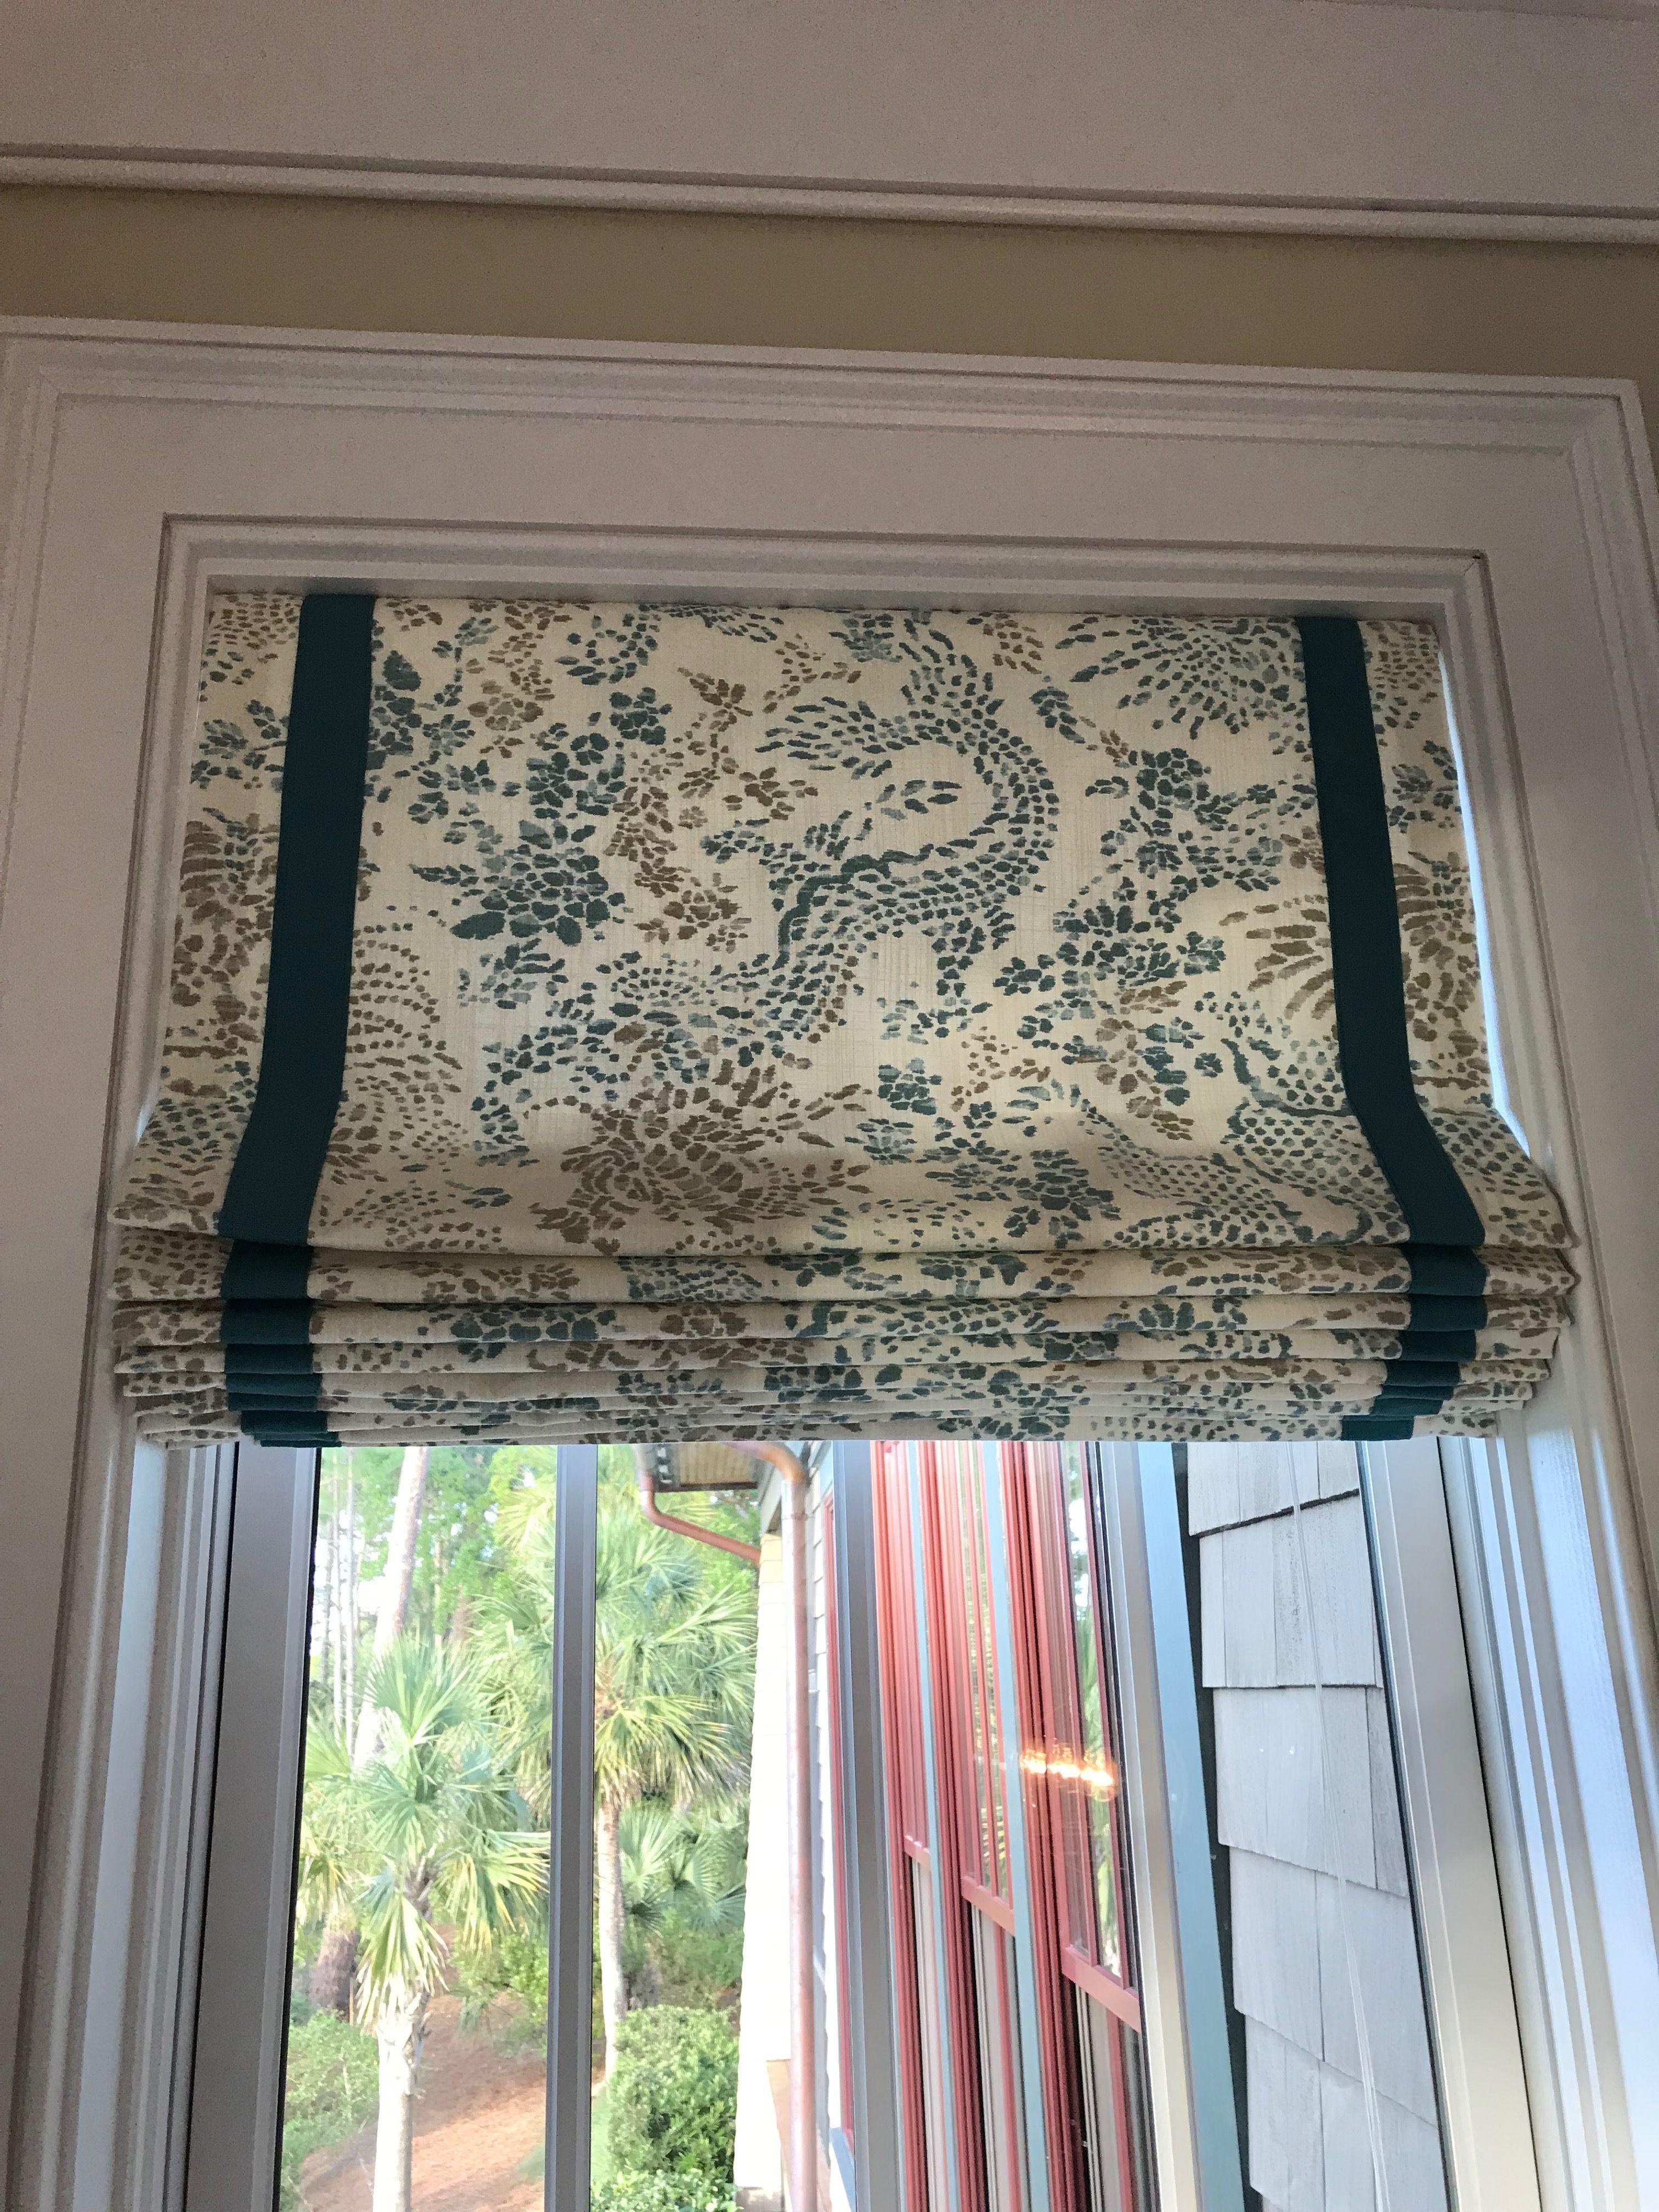 Bay window treatments drapes curtains valance drapery window dressings curtain ideas